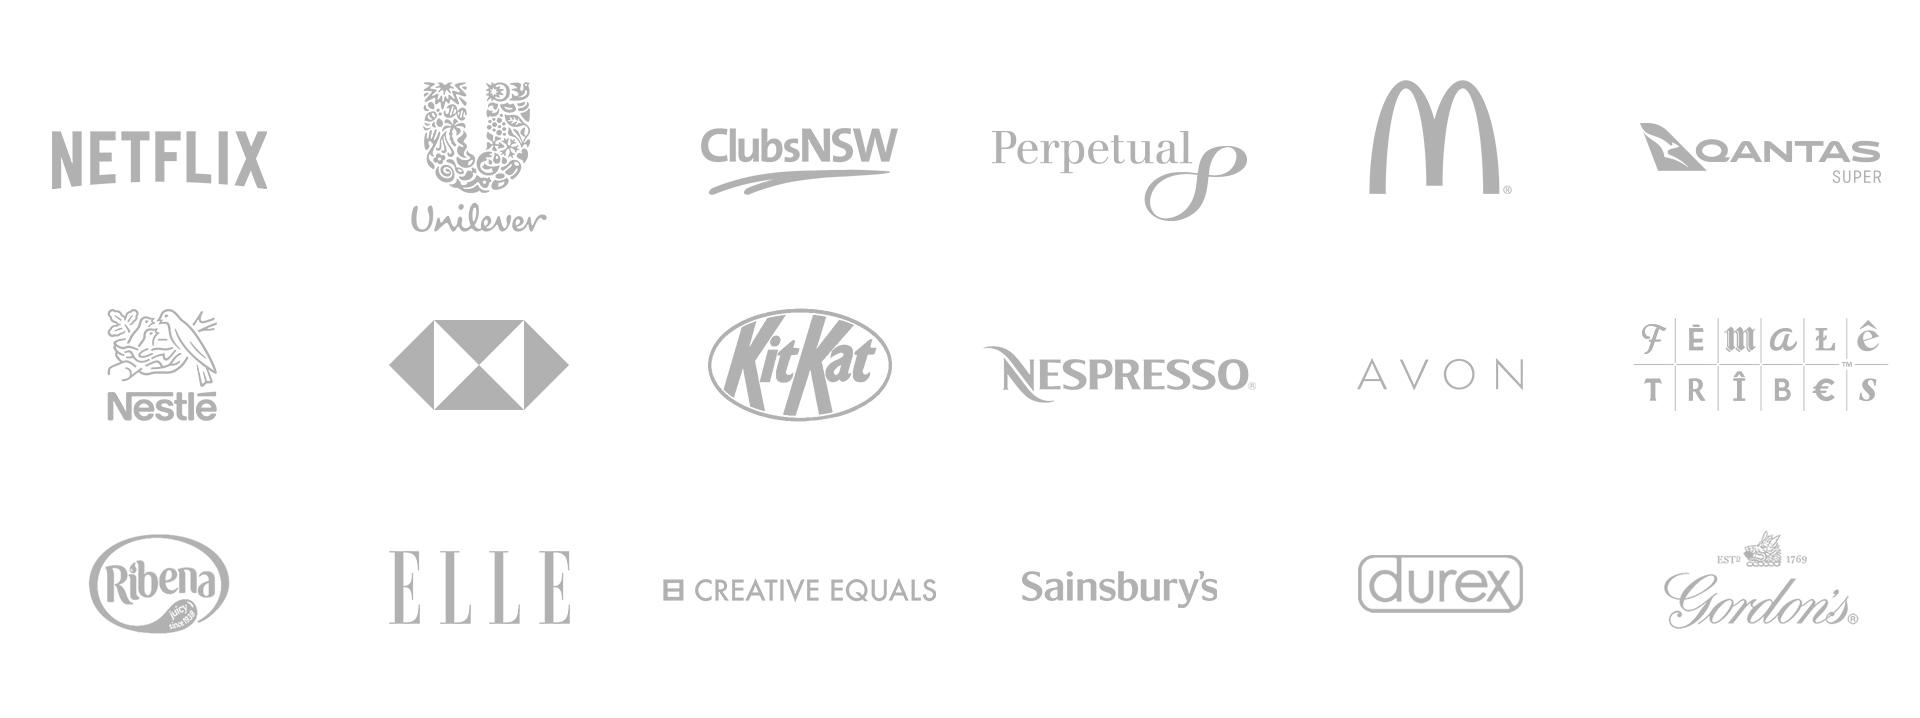 Emilie_website_logos_2019_3.jpg